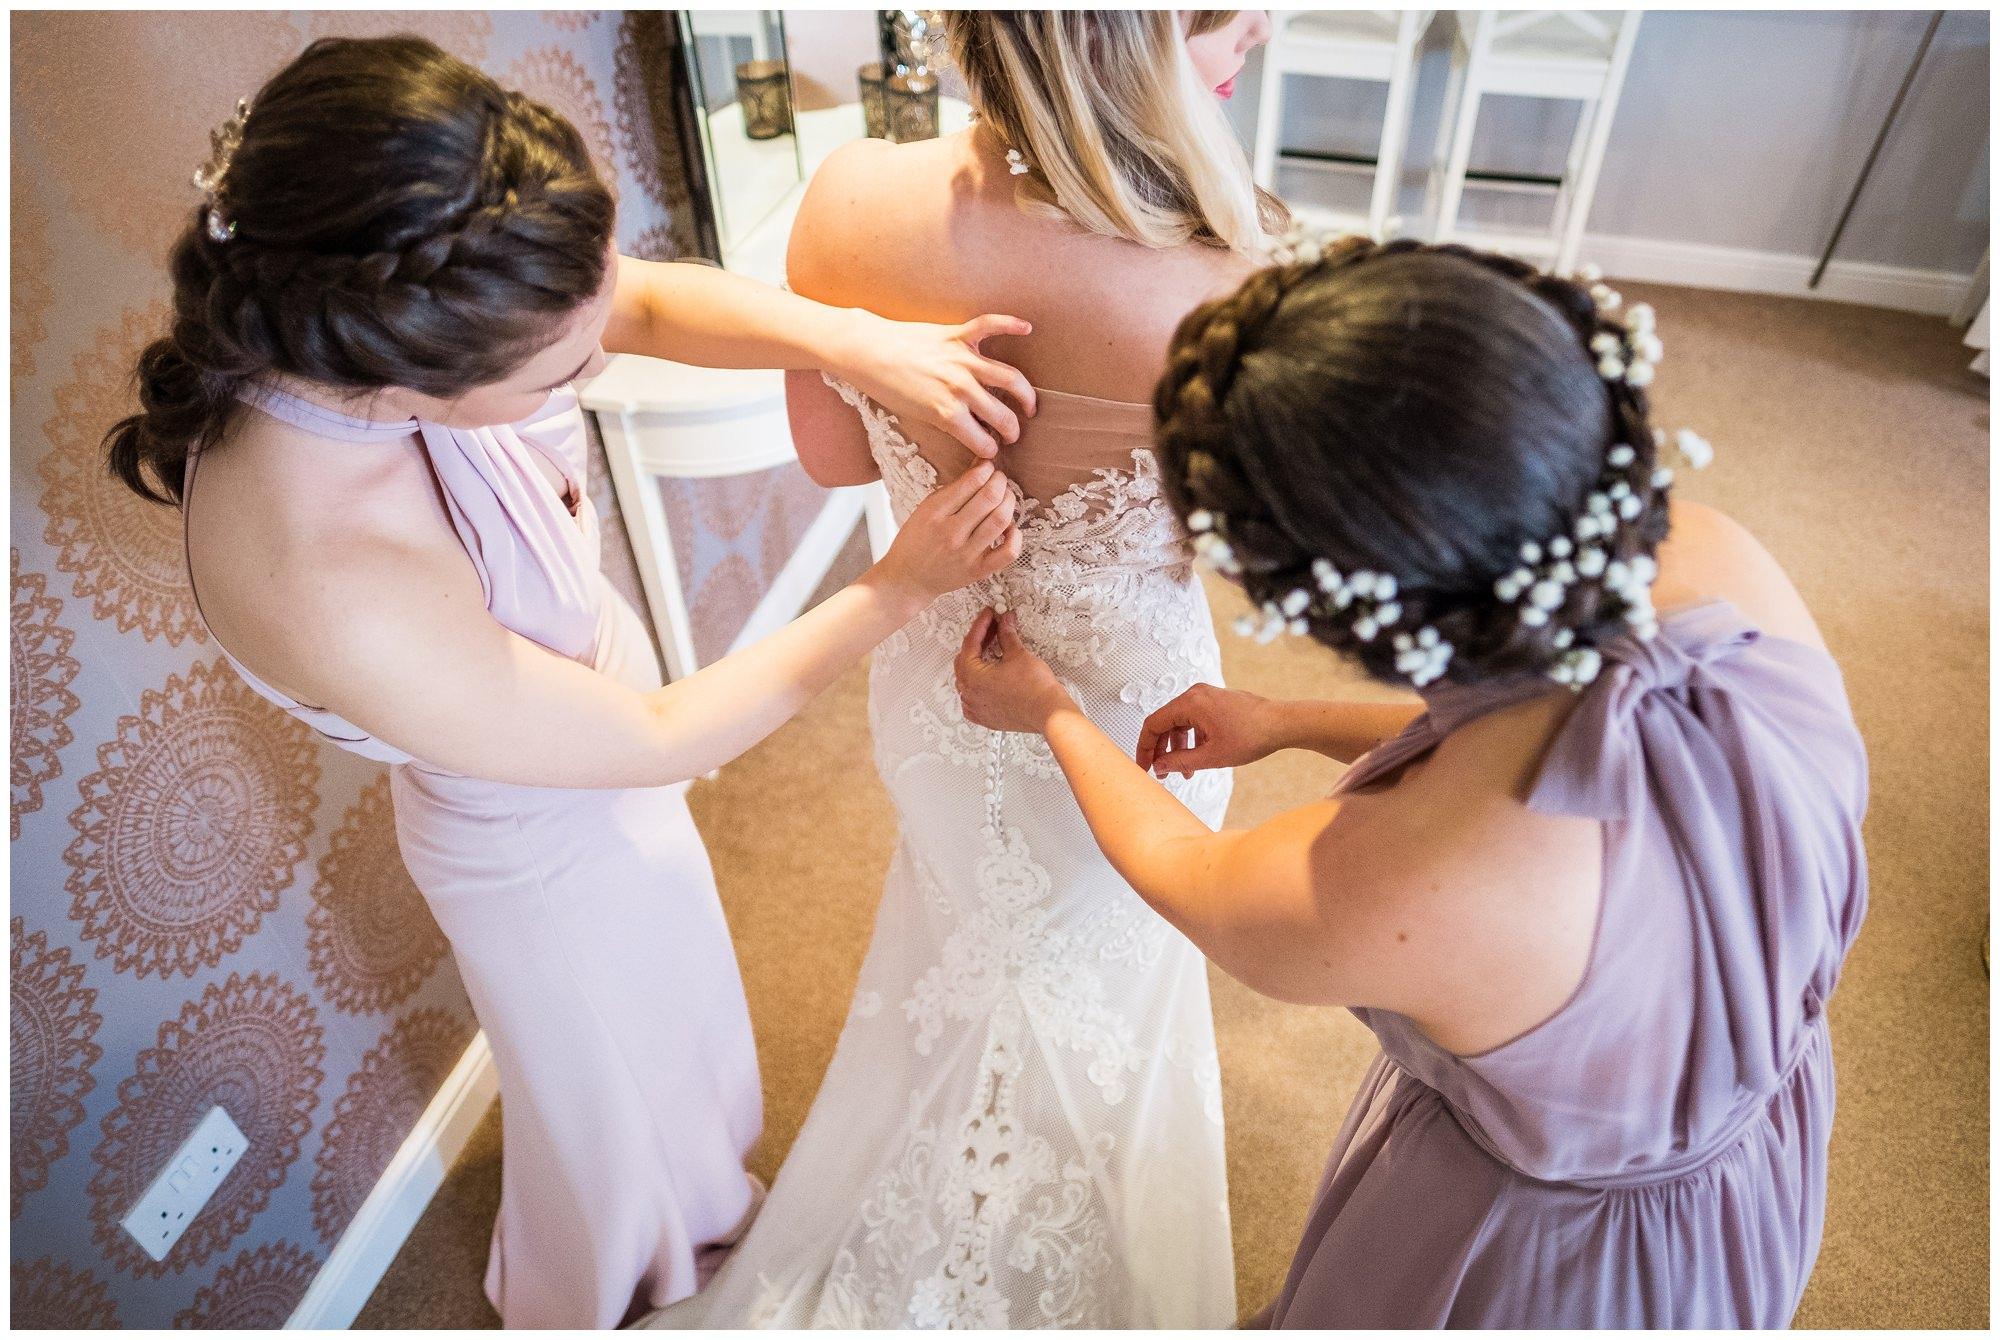 bridesmaids helping with wedding dress